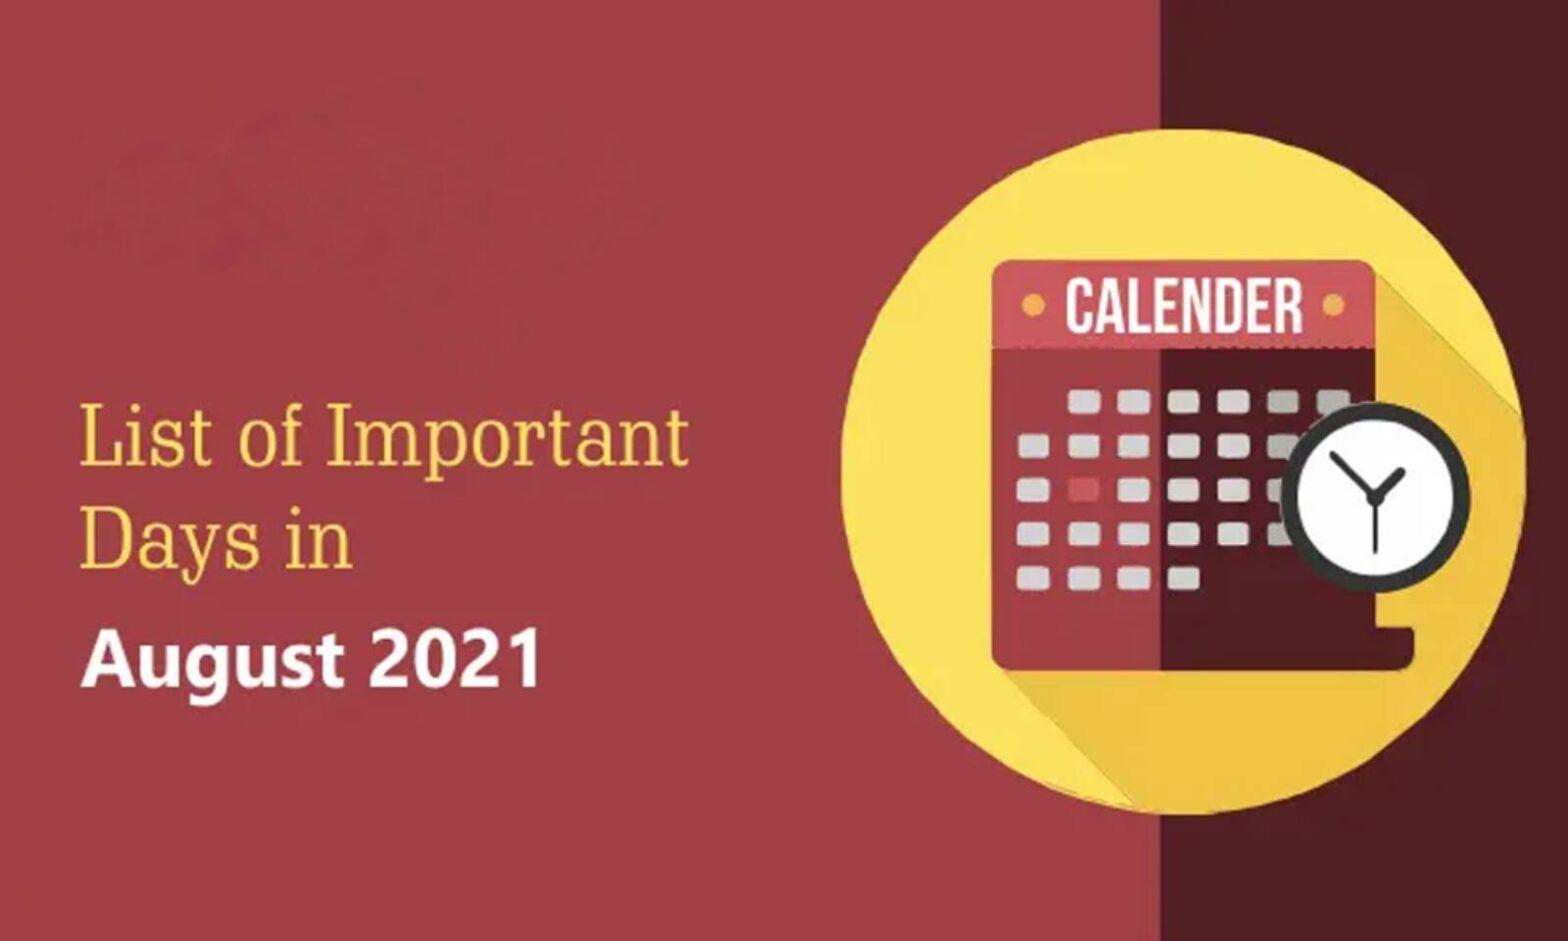 List of Important Days in August 2021 | 2021 ആഗസ്റ്റിലെ പ്രധാന ദിവസങ്ങളുടെ പട്ടിക_40.1